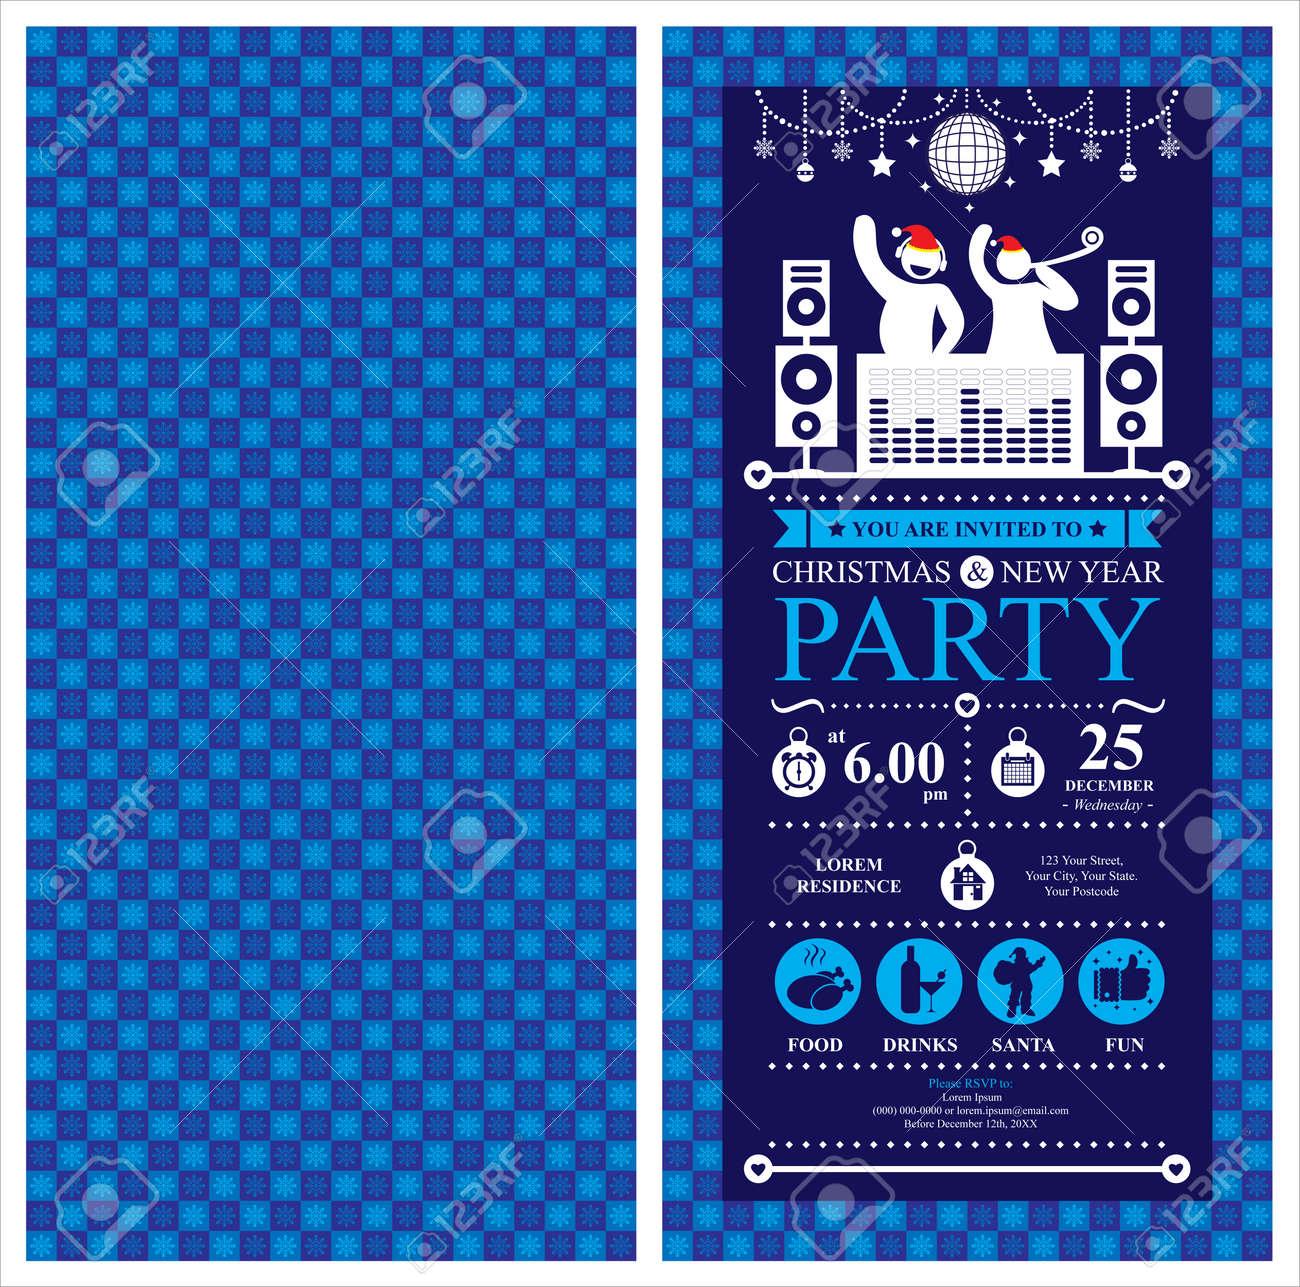 Christmas Party Invitation Card - 39181448